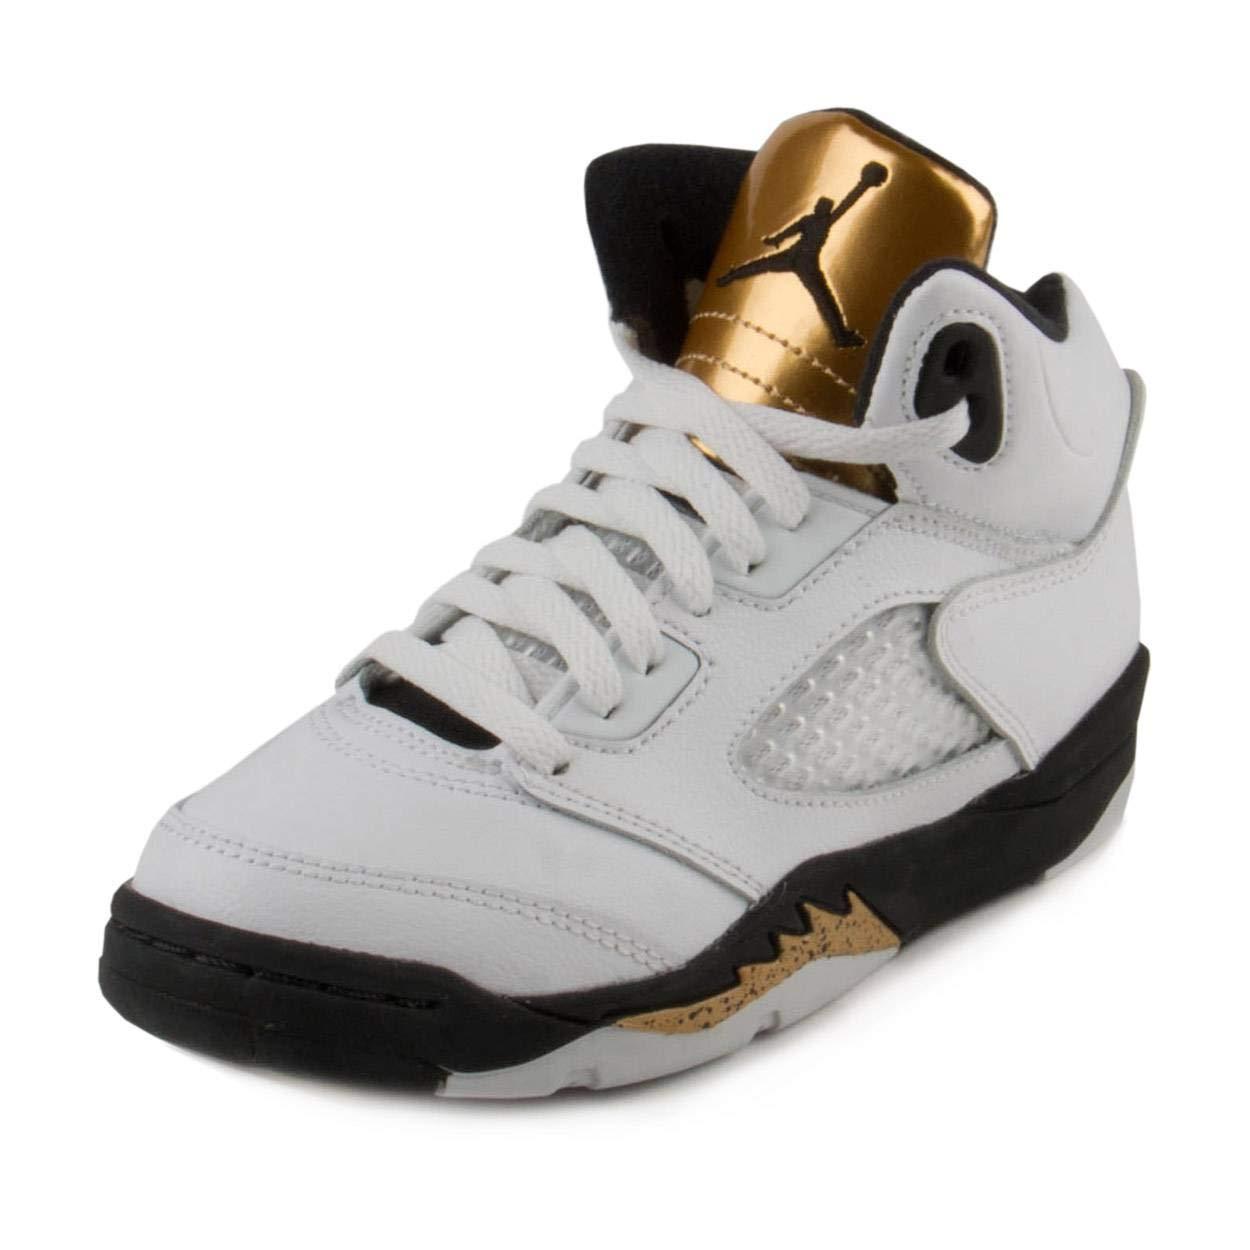 timeless design feb95 c1d2a Amazon.com   Nike Baby Boys Air Jordan 5 Retro BG